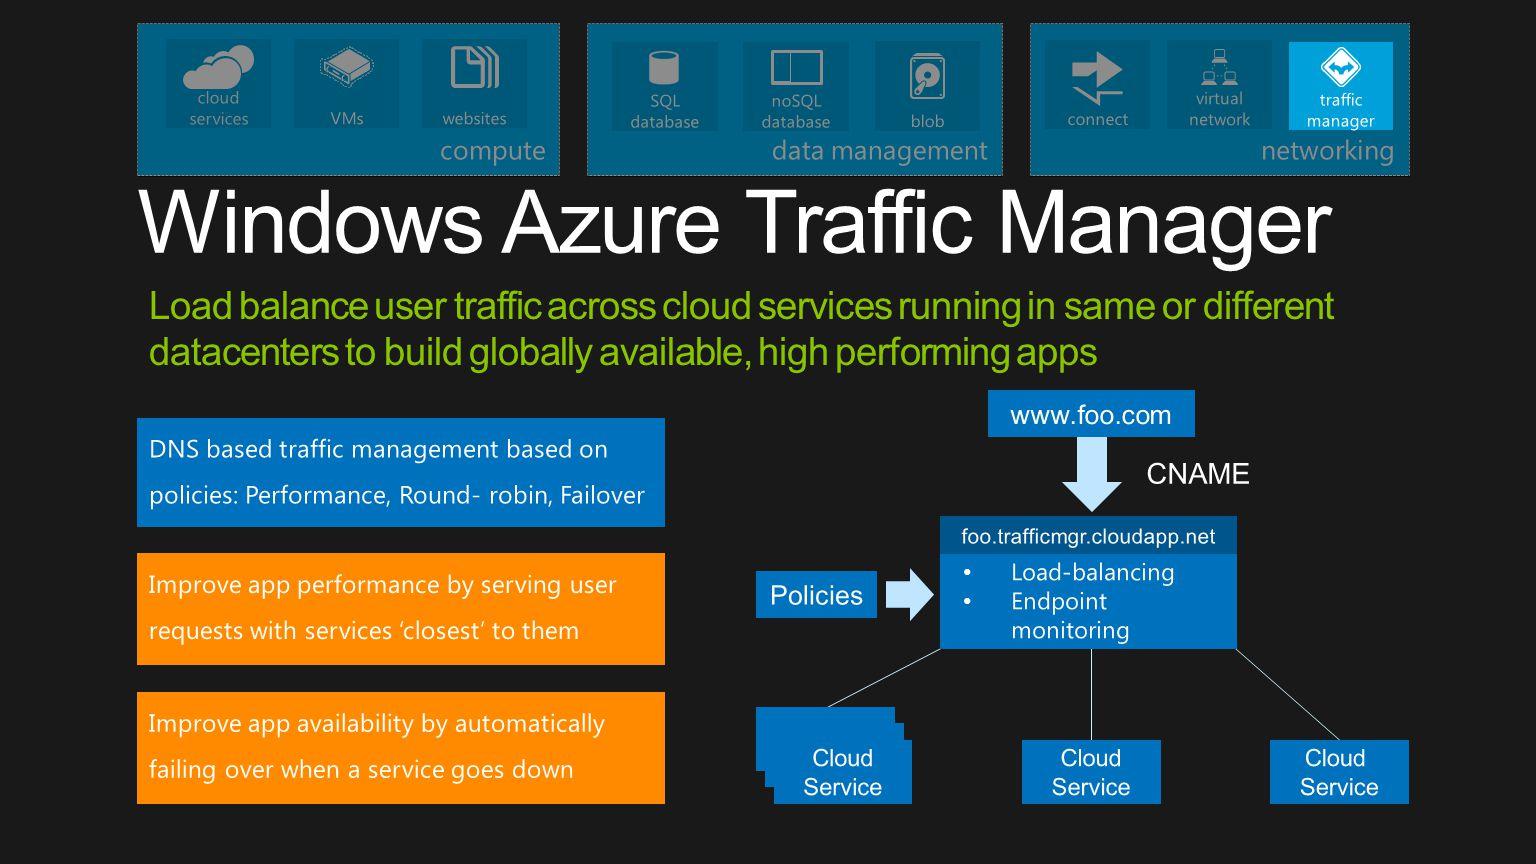 Windows Azure Traffic Manager